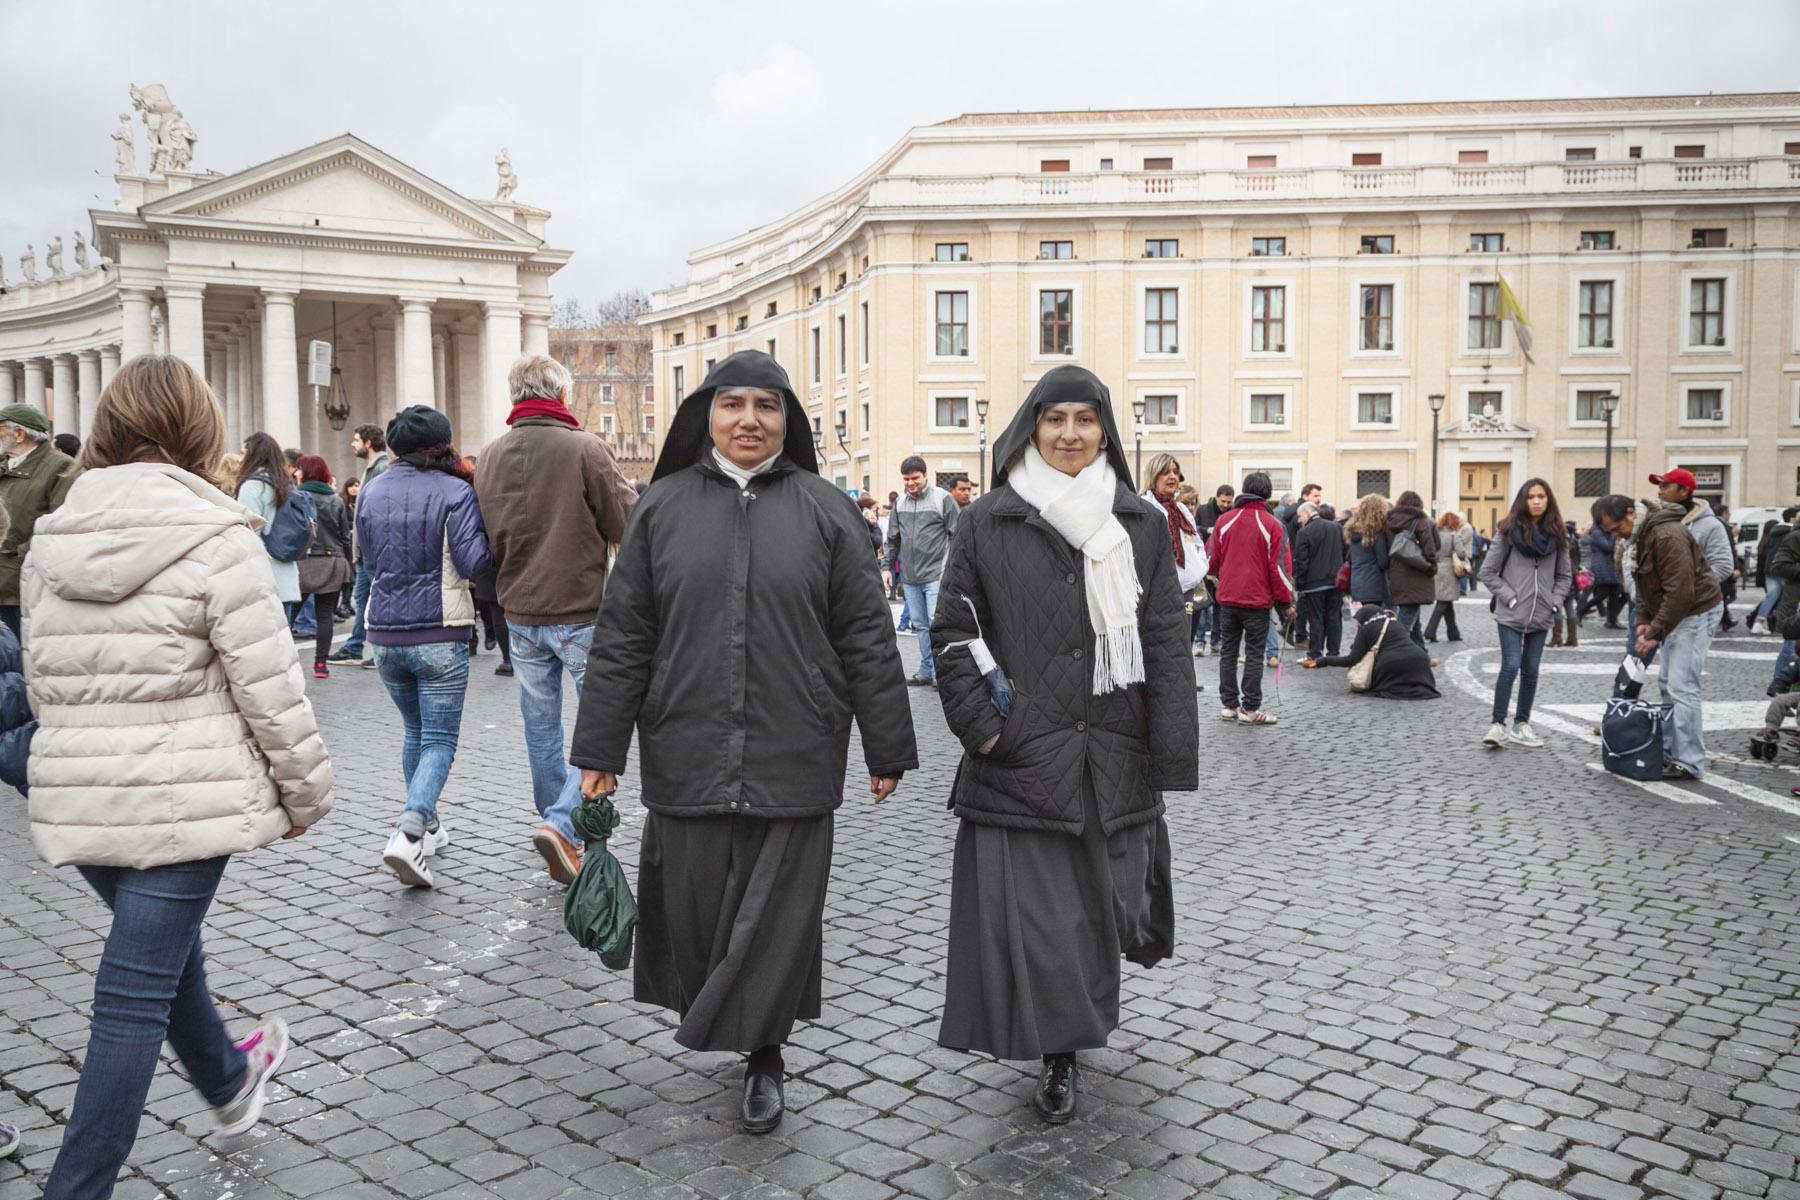 Chiara Spaghetti Kurtovic Popes Two 14